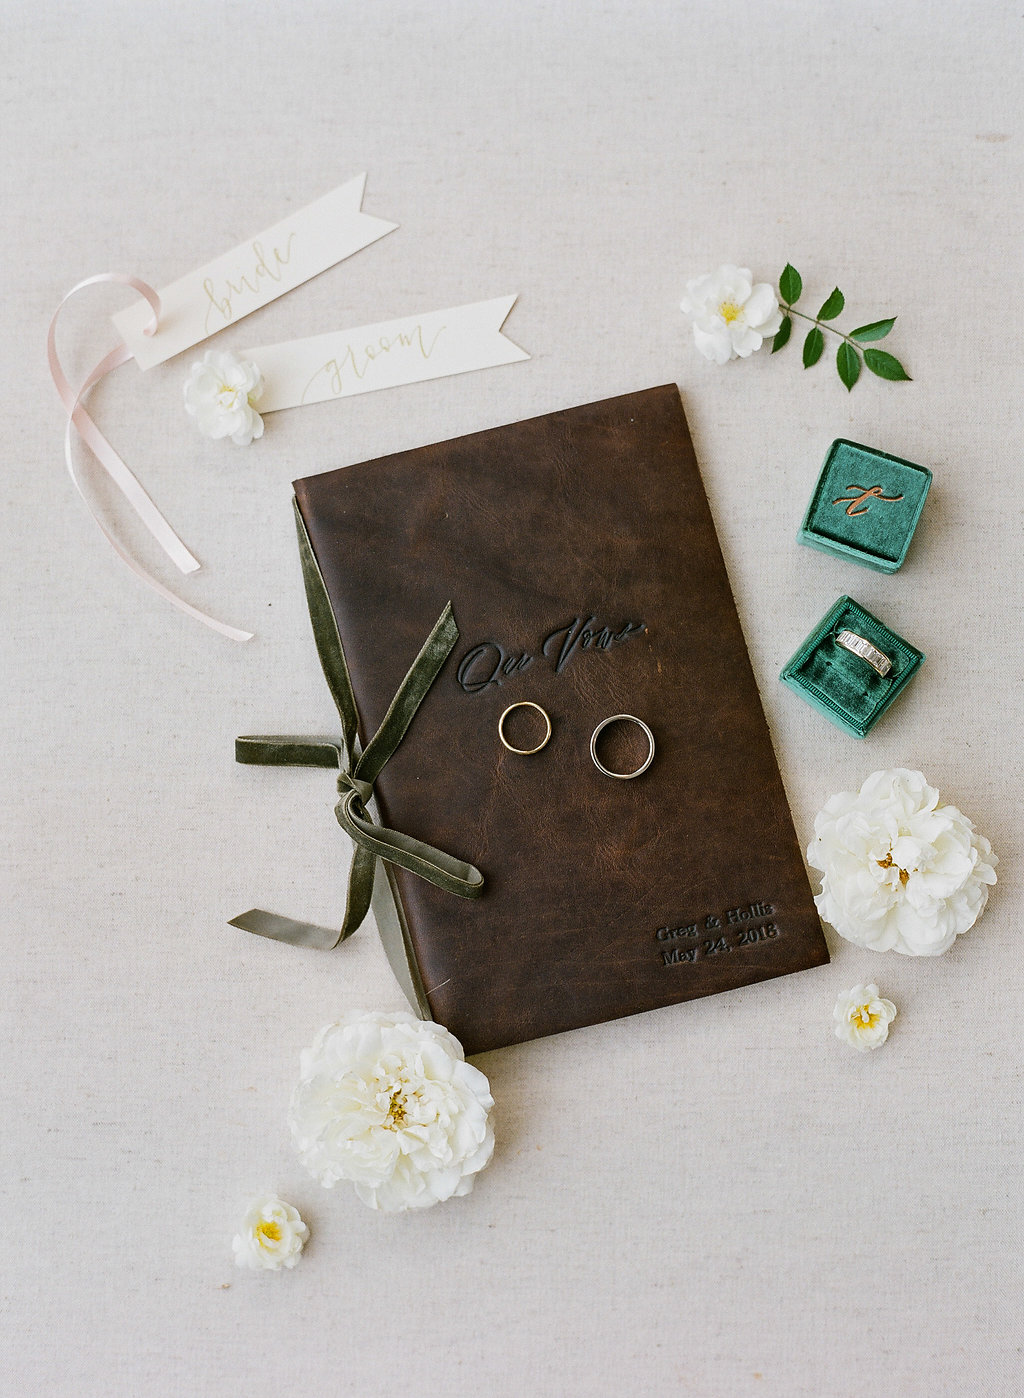 santa-barbara-elopement-wedding-planning-planner-coordinator-day-of-week-small-wedding-el-encanto-lily-pond-pink-kids-garden-riviera-elope-design-estate-candle (5).jpg